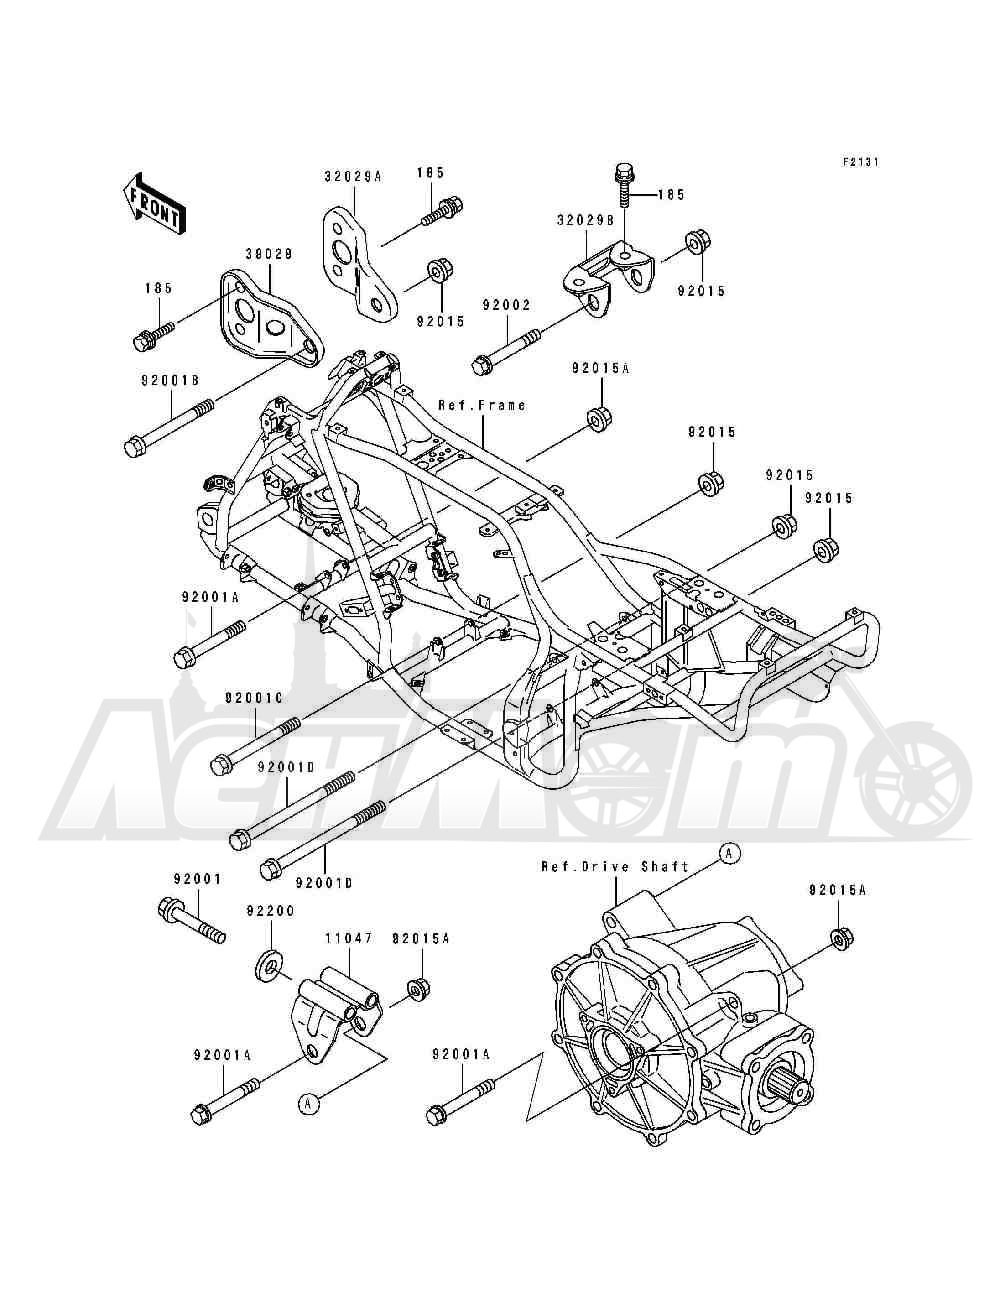 Запчасти для Квадроцикла Kawasaki 1994 BAYOU 400 4X4 (KLF400-B2) Раздел: FRAME FITTINGS | рама фитинги